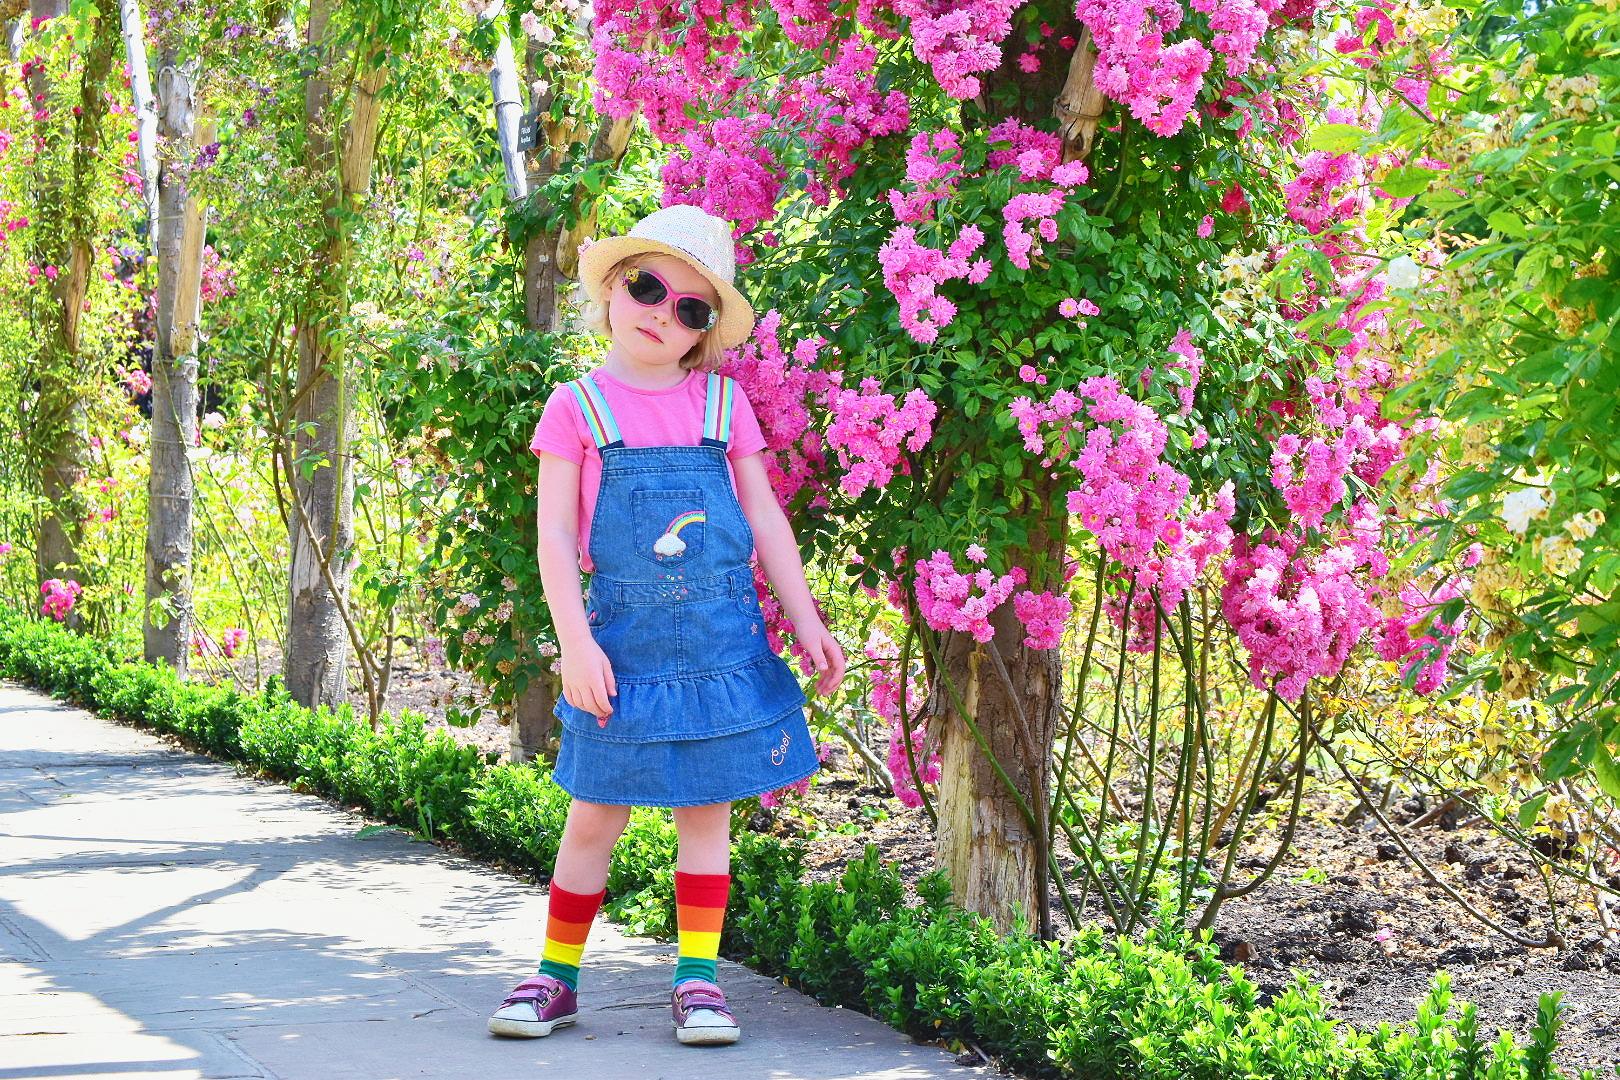 Vertbaudet summer clothing range